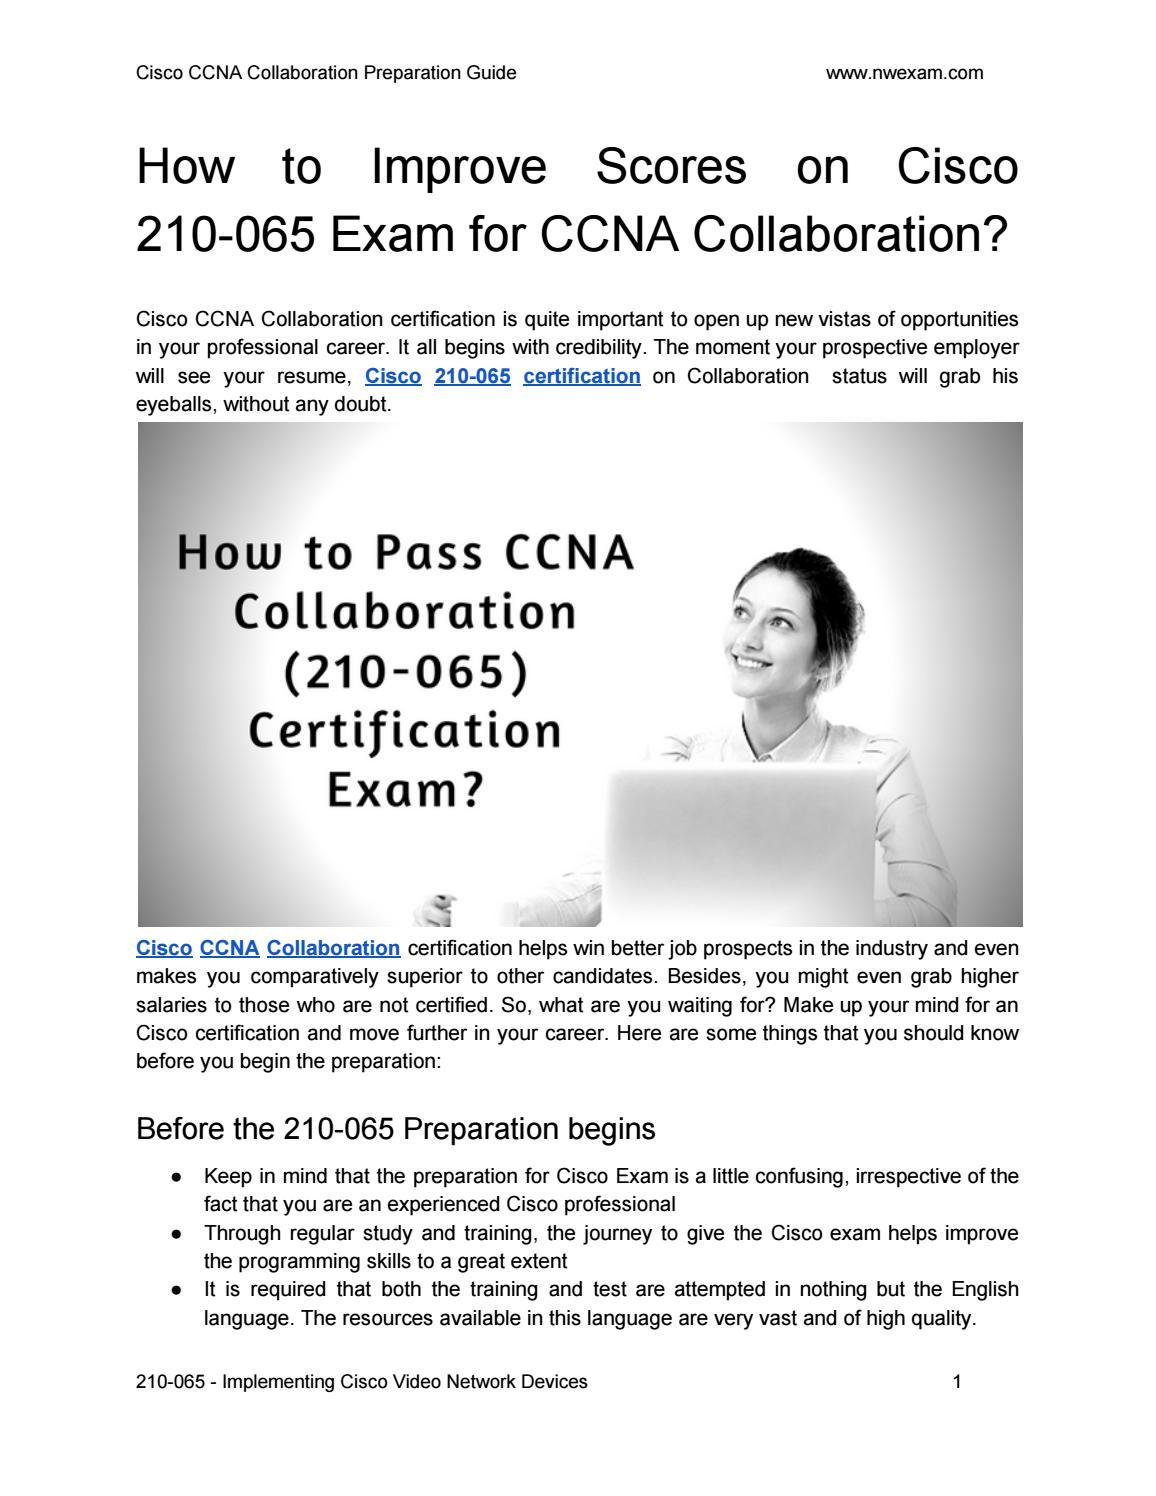 How To Improve Scores On Cisco 210 065 Exam For Ccna Collaboration